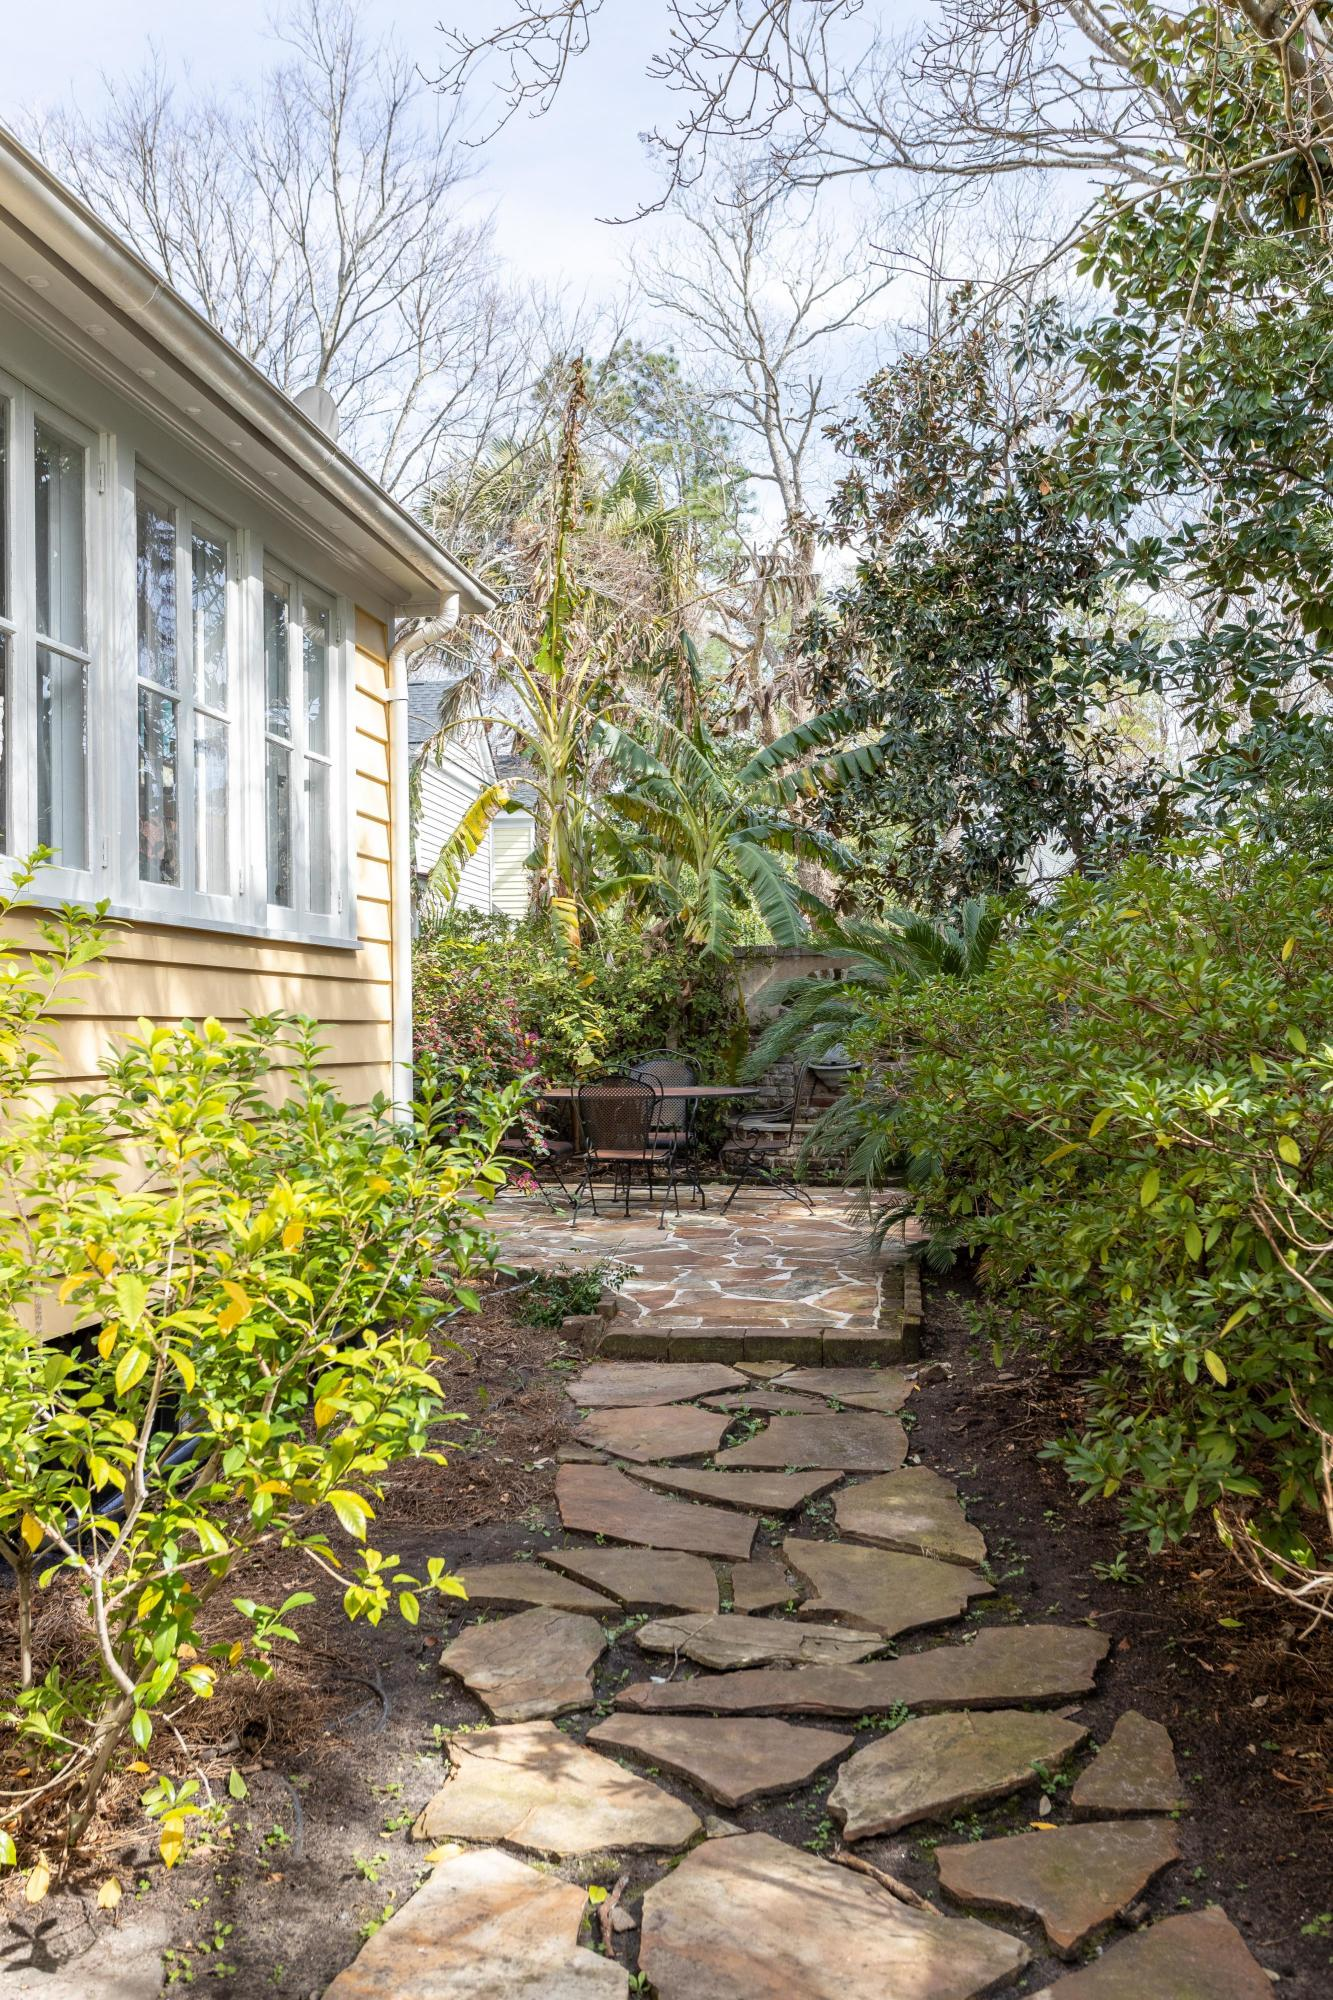 Radcliffeborough Homes For Sale - 104 Smith, Charleston, SC - 3